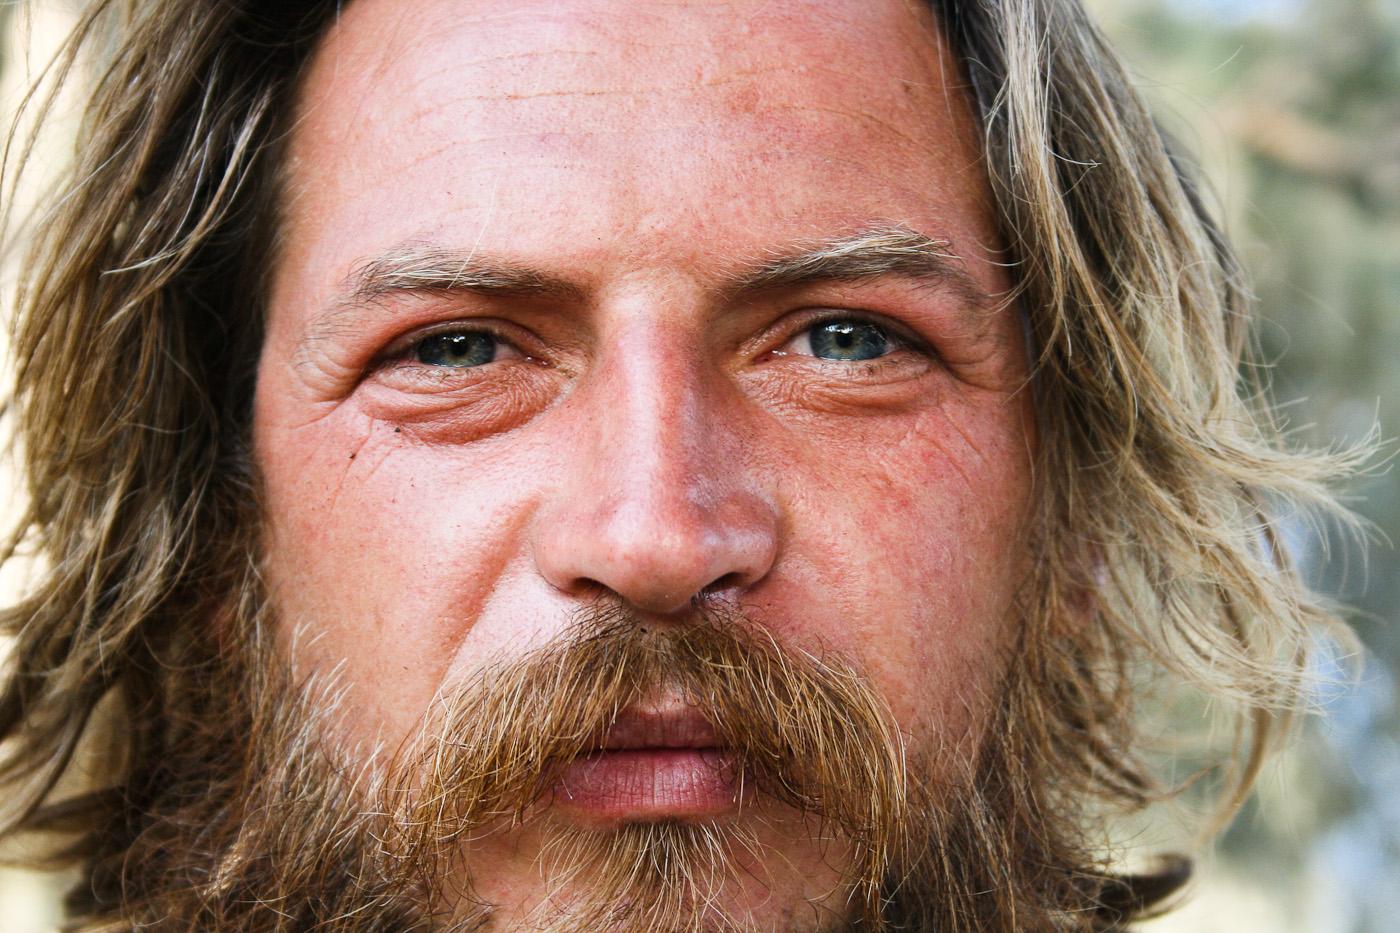 My caveman friend in Matala (Greece)